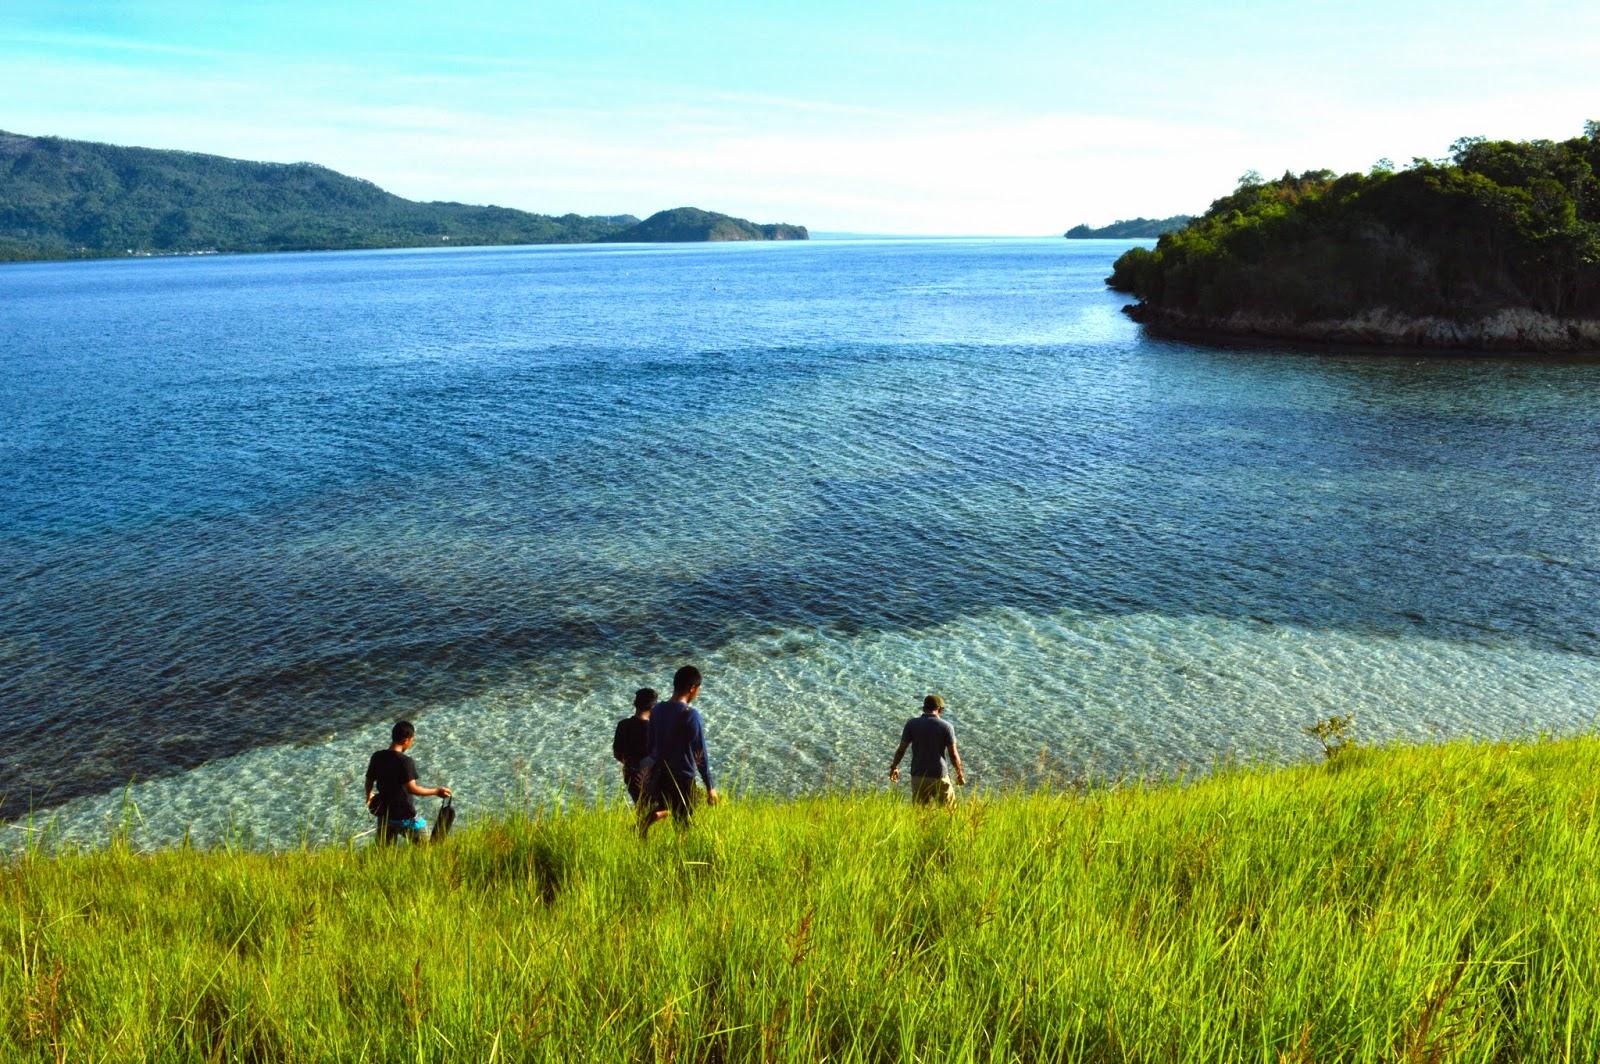 Qobul Januari 2015 Pulau Naga Dakokayu Pantai Ratatotok Kab Minahasa